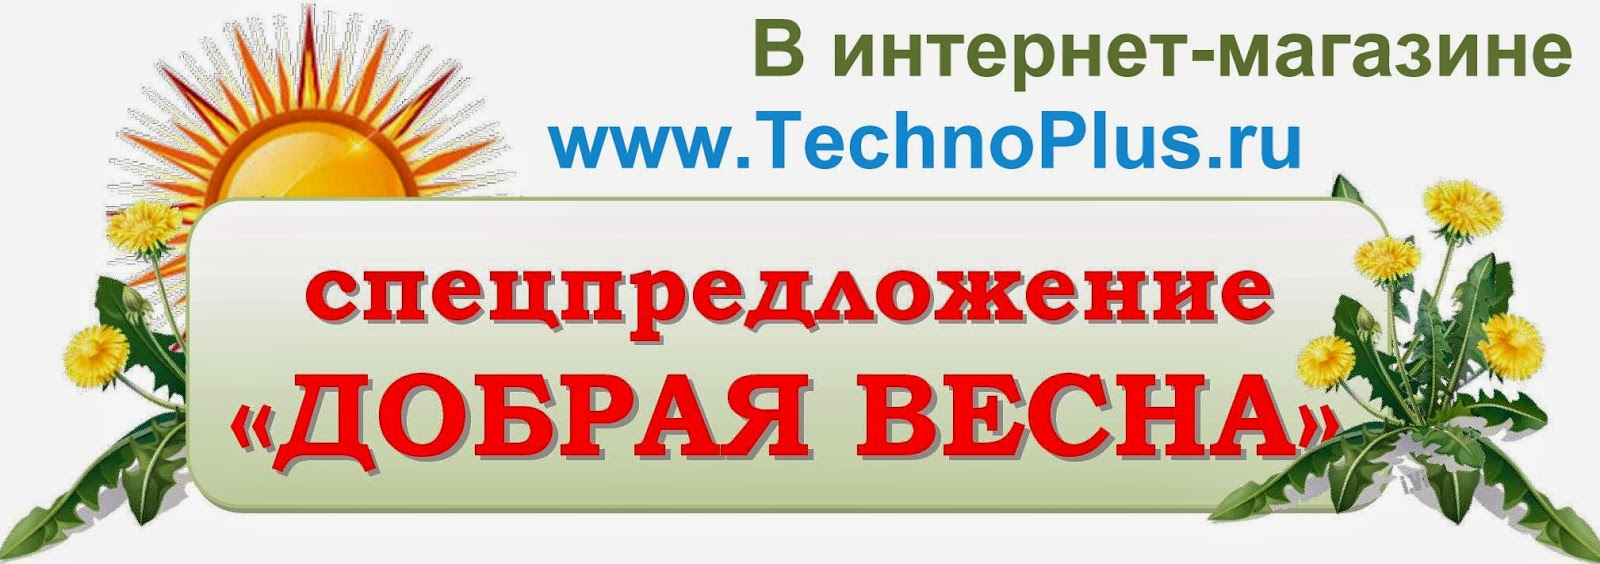 Спецпредложения в интернет-магазине TechnoPlus.ru